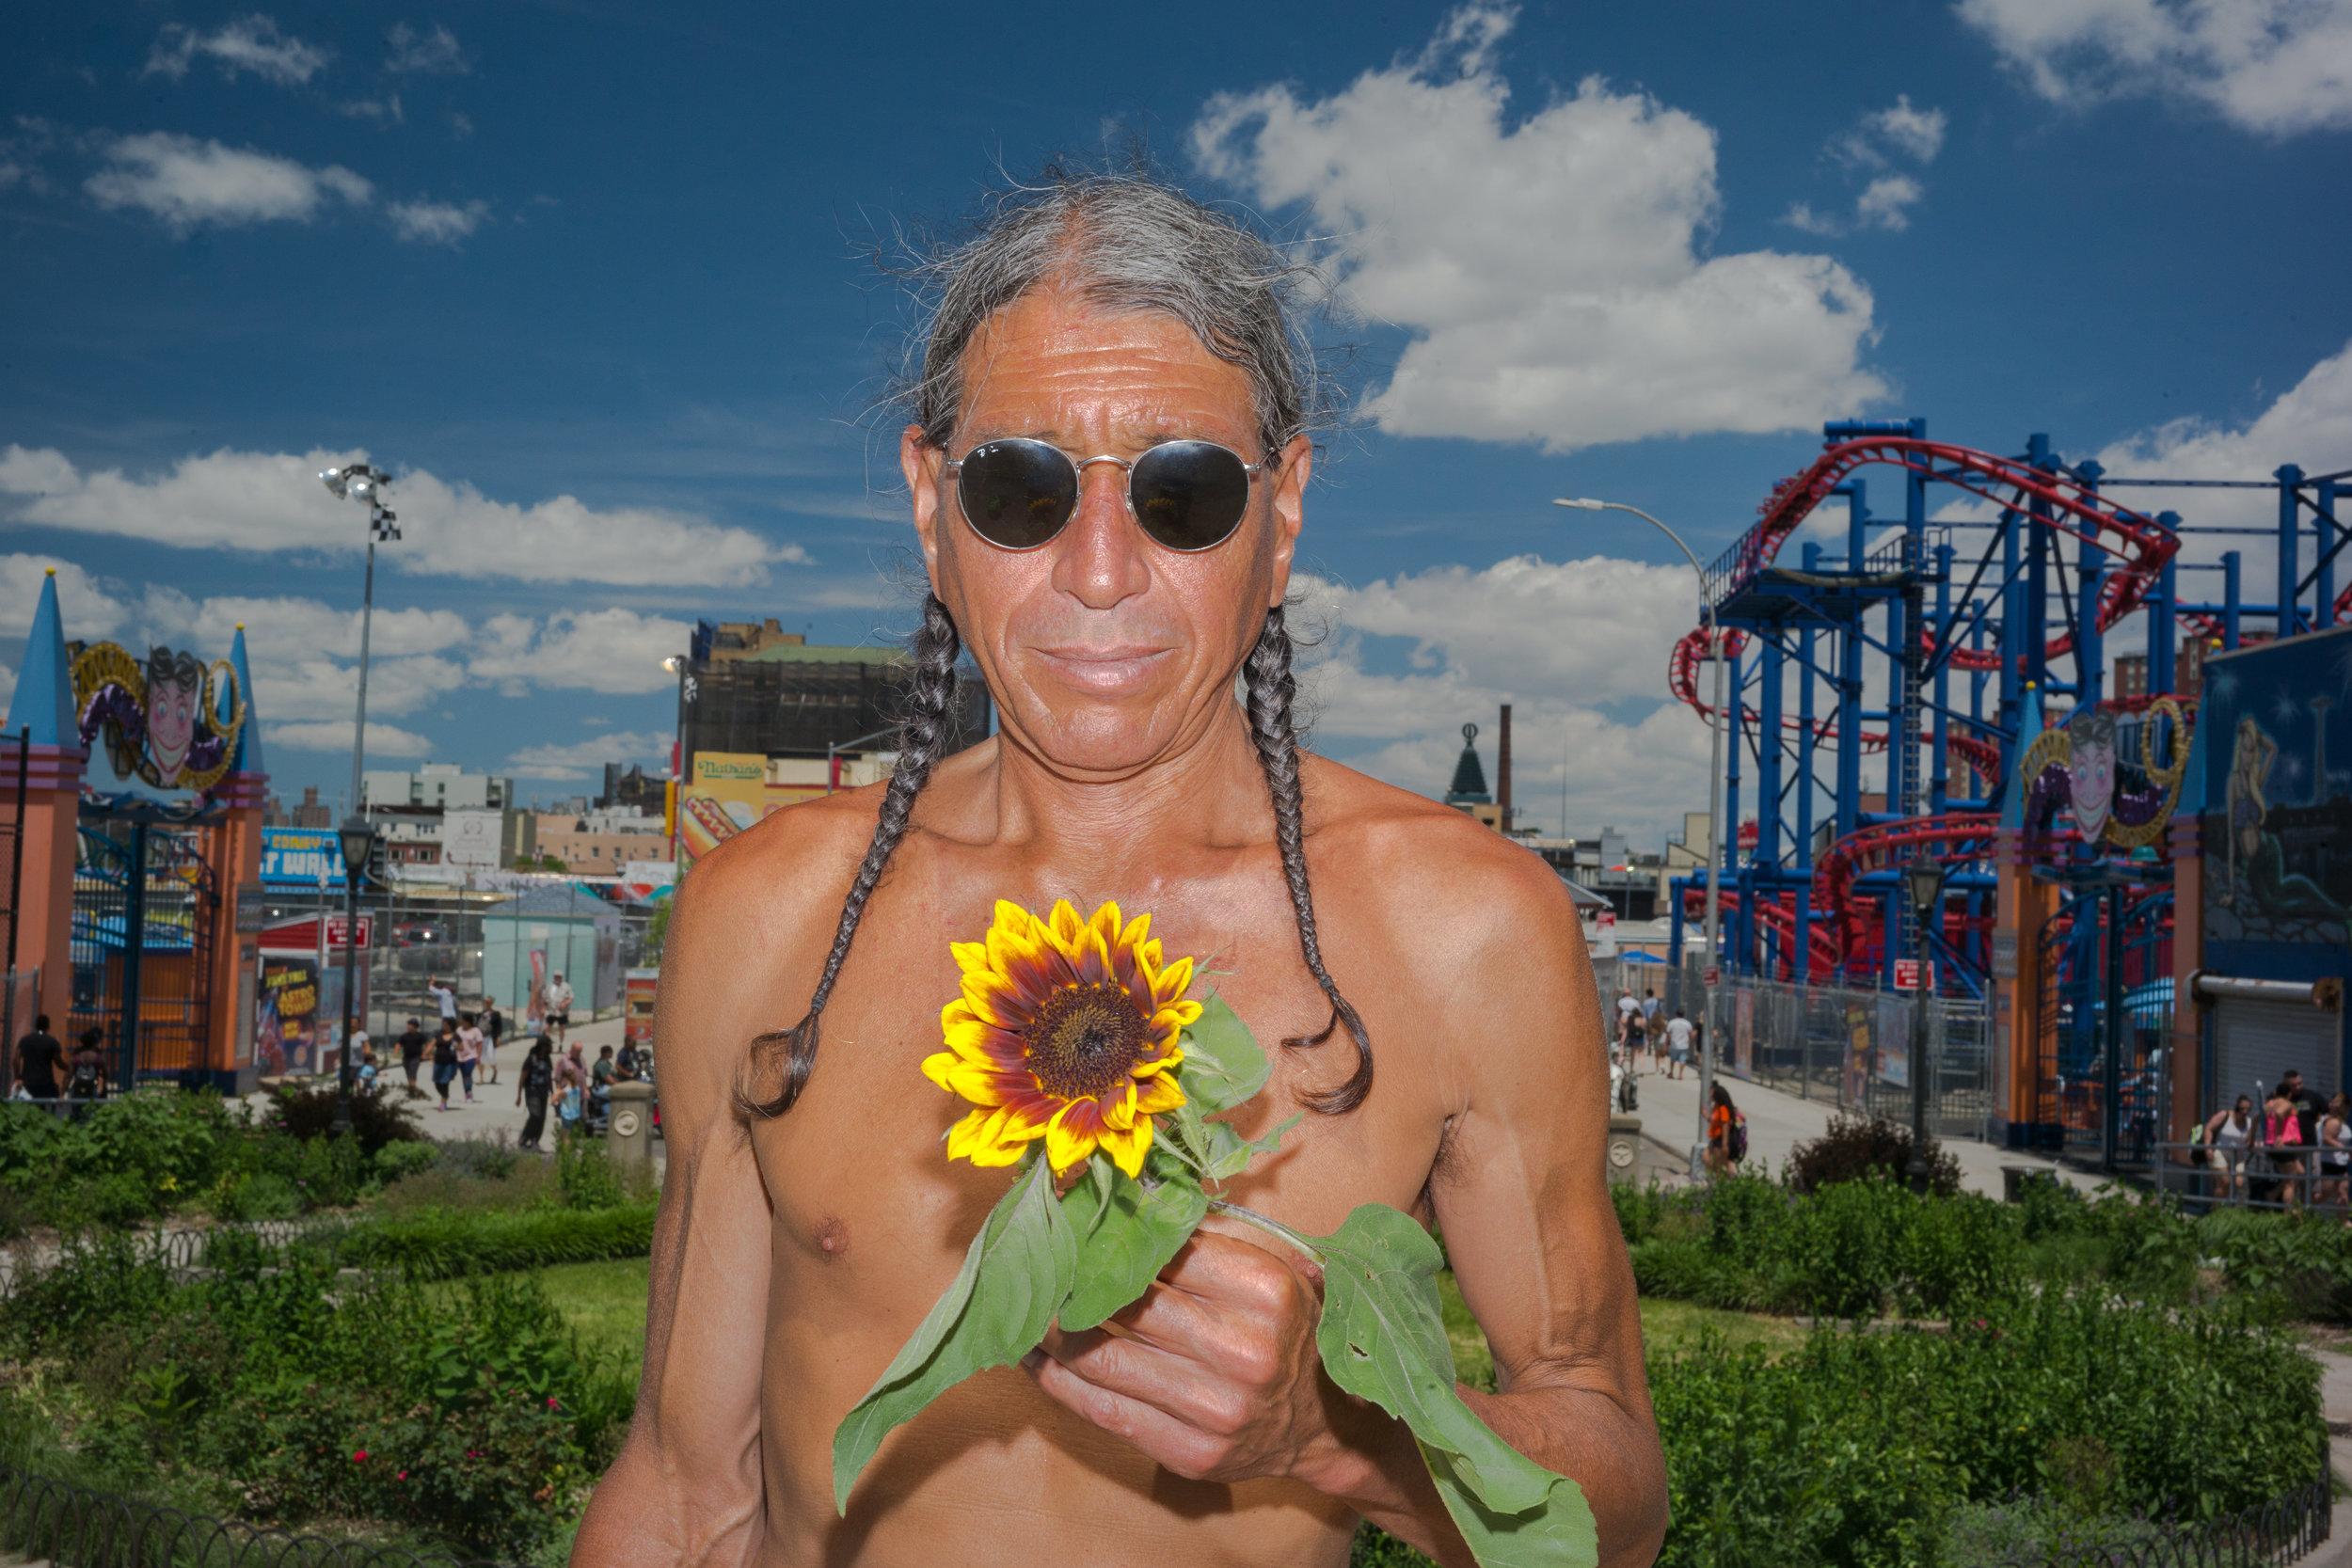 Lot 578 Beach Body Bingo - Indian Summer - Photograph